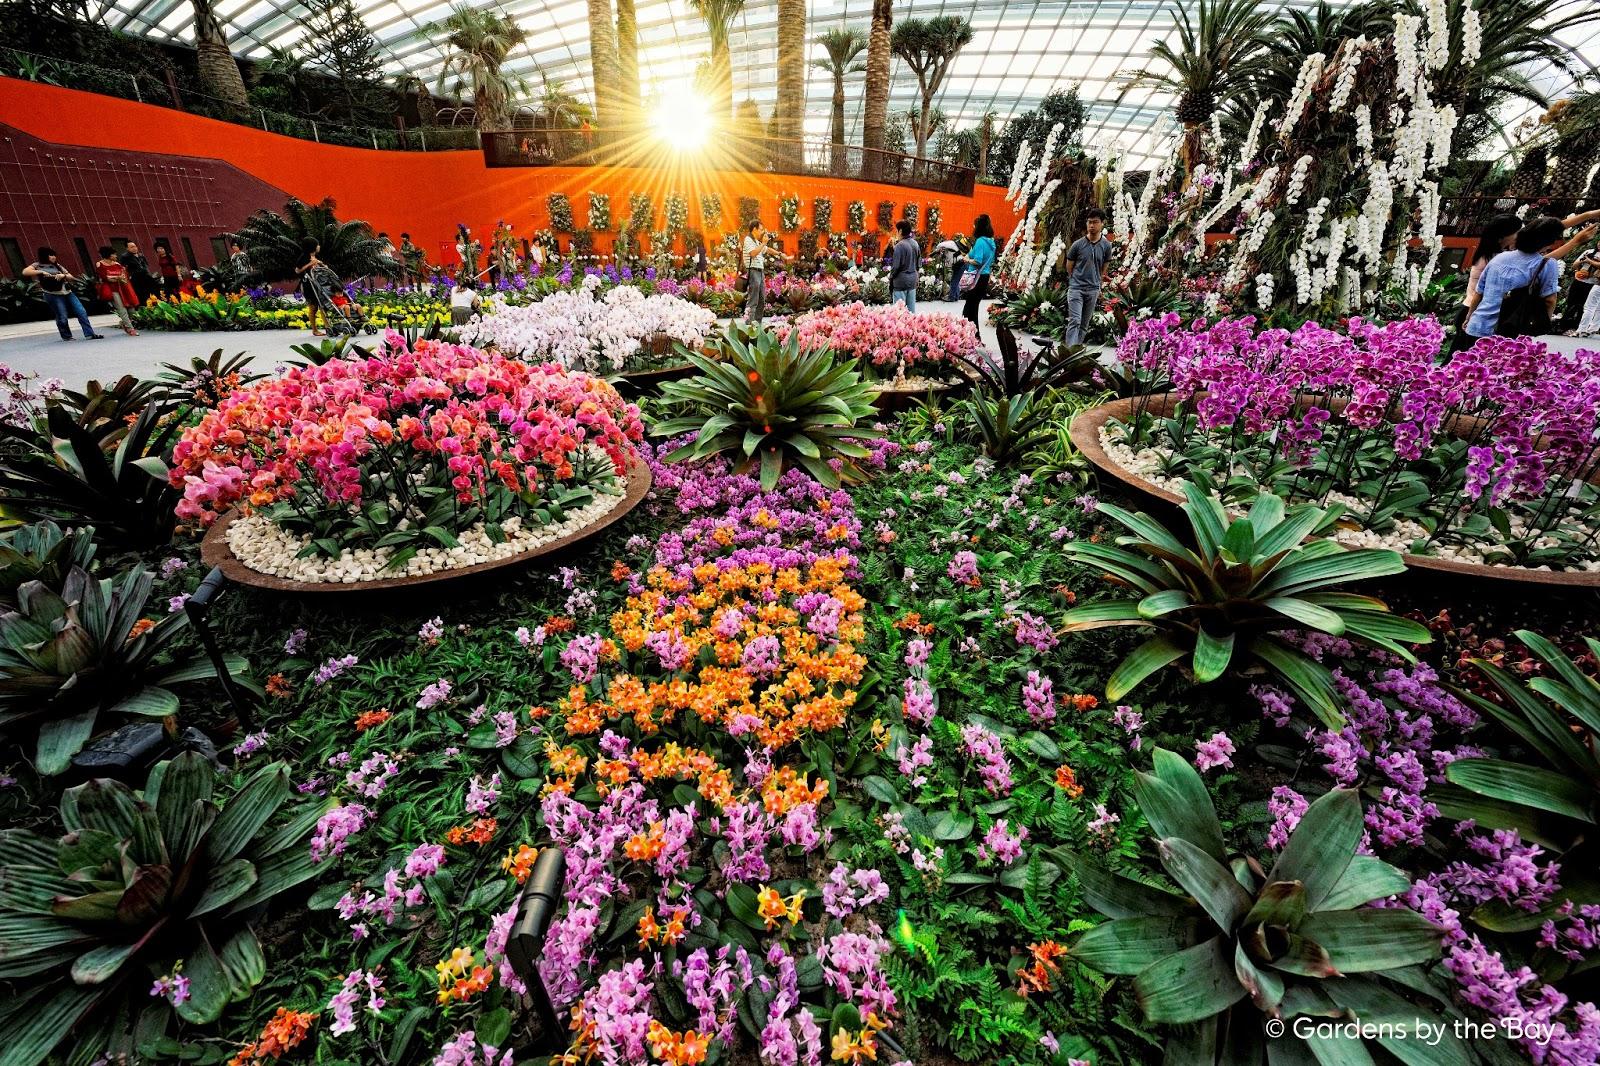 La buena vida singapore in photos gardens by the bay - Garden by the bay flower show ...